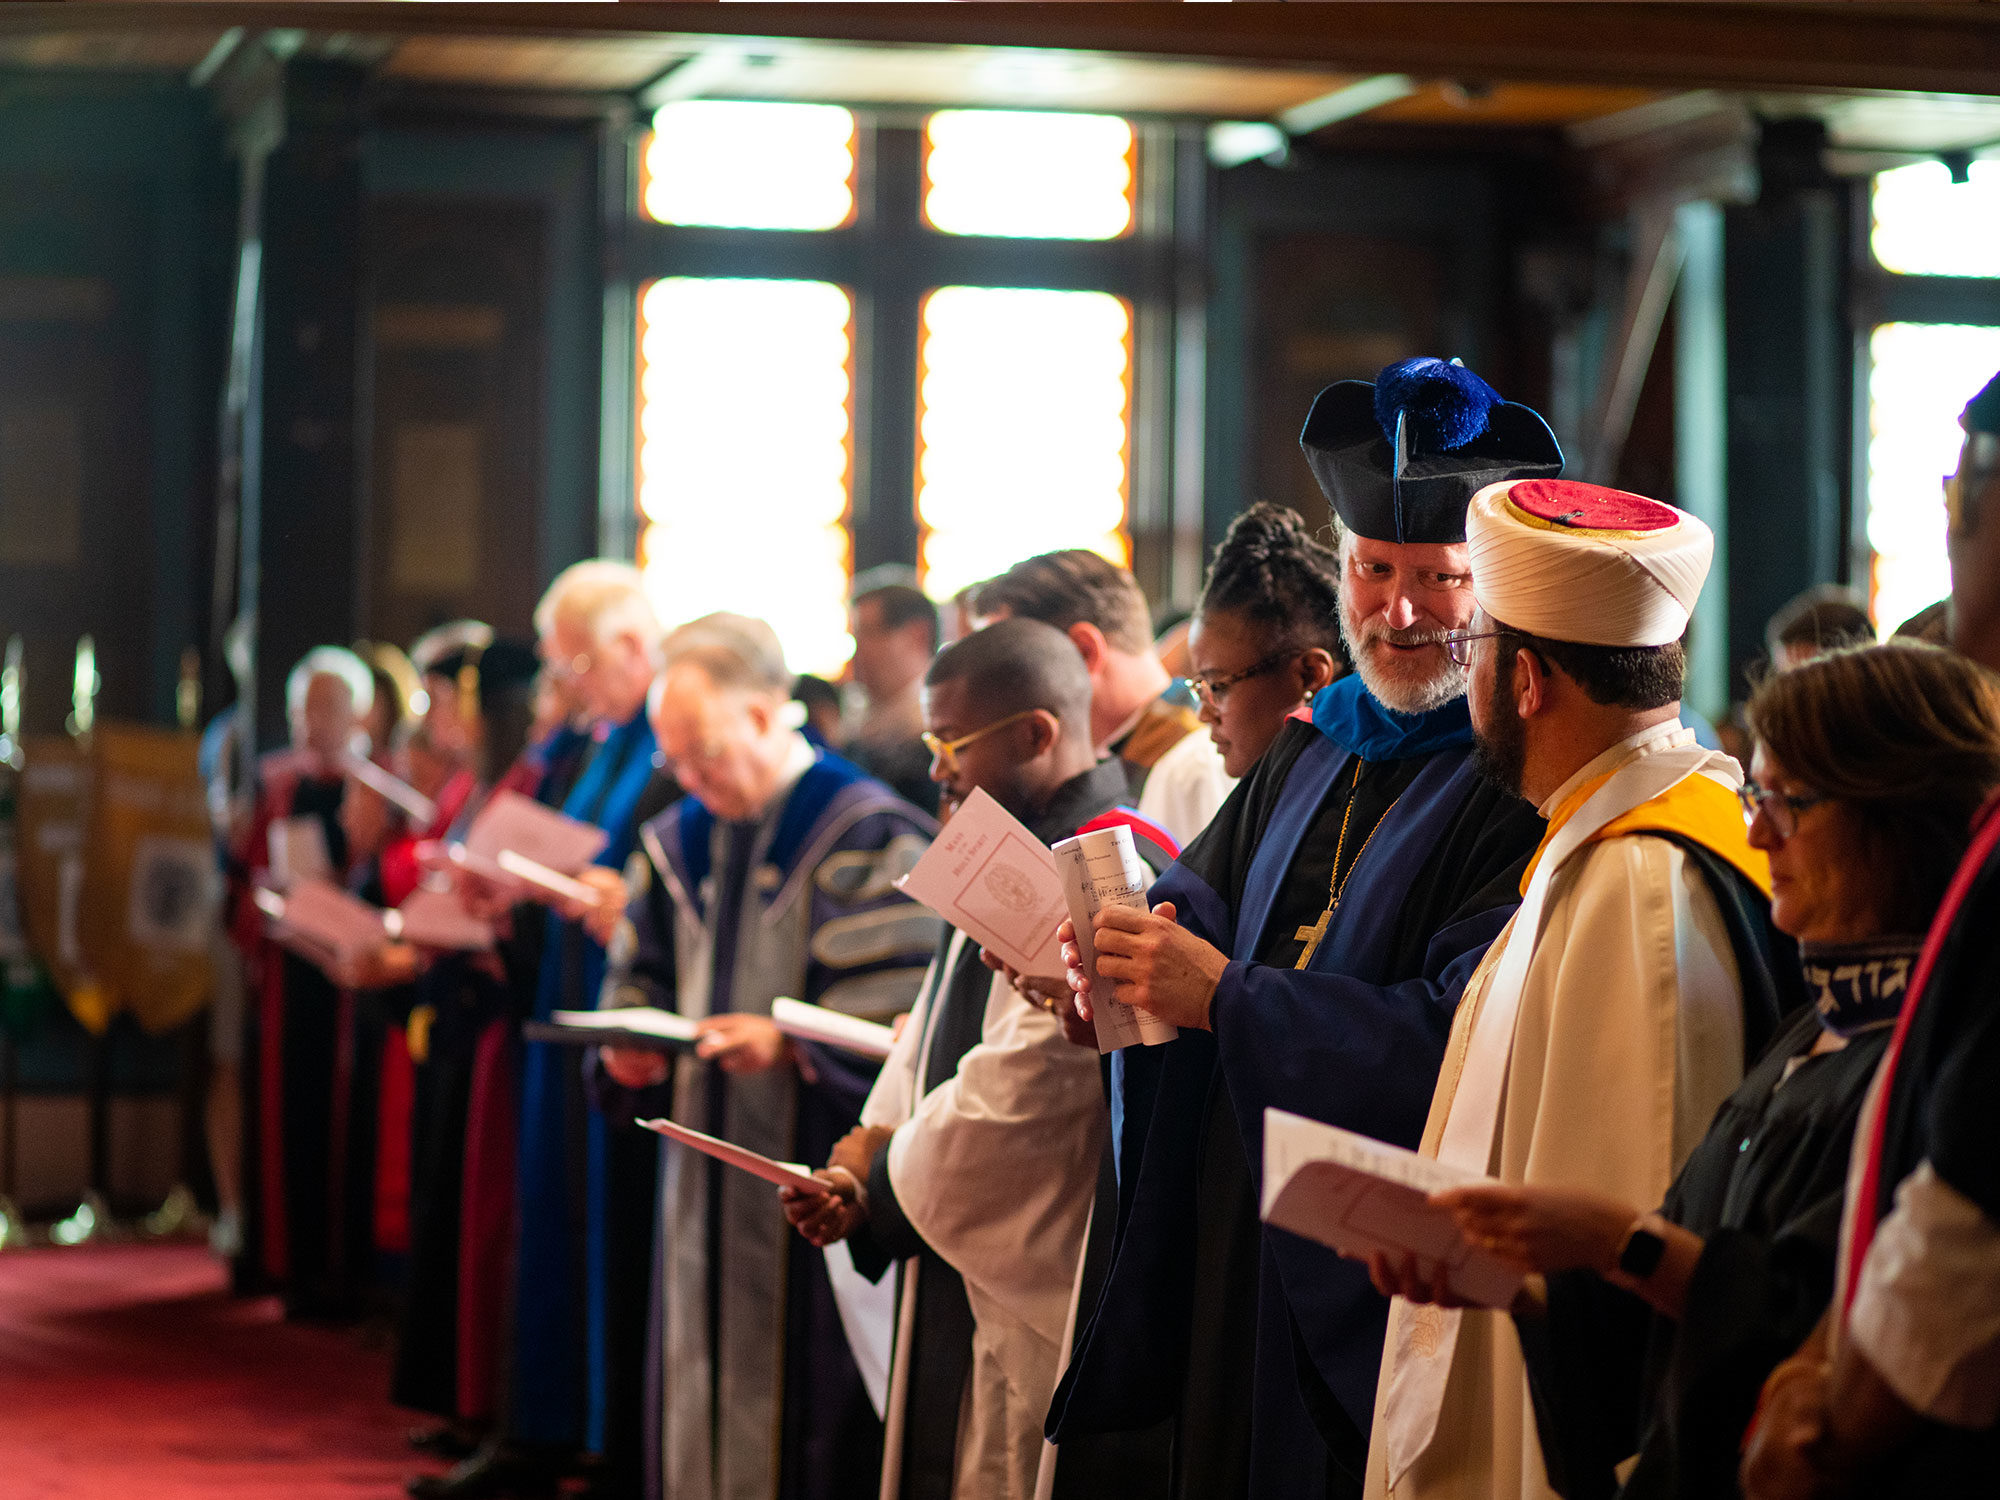 Georgetown interfaith chaplains in Gaston Hall